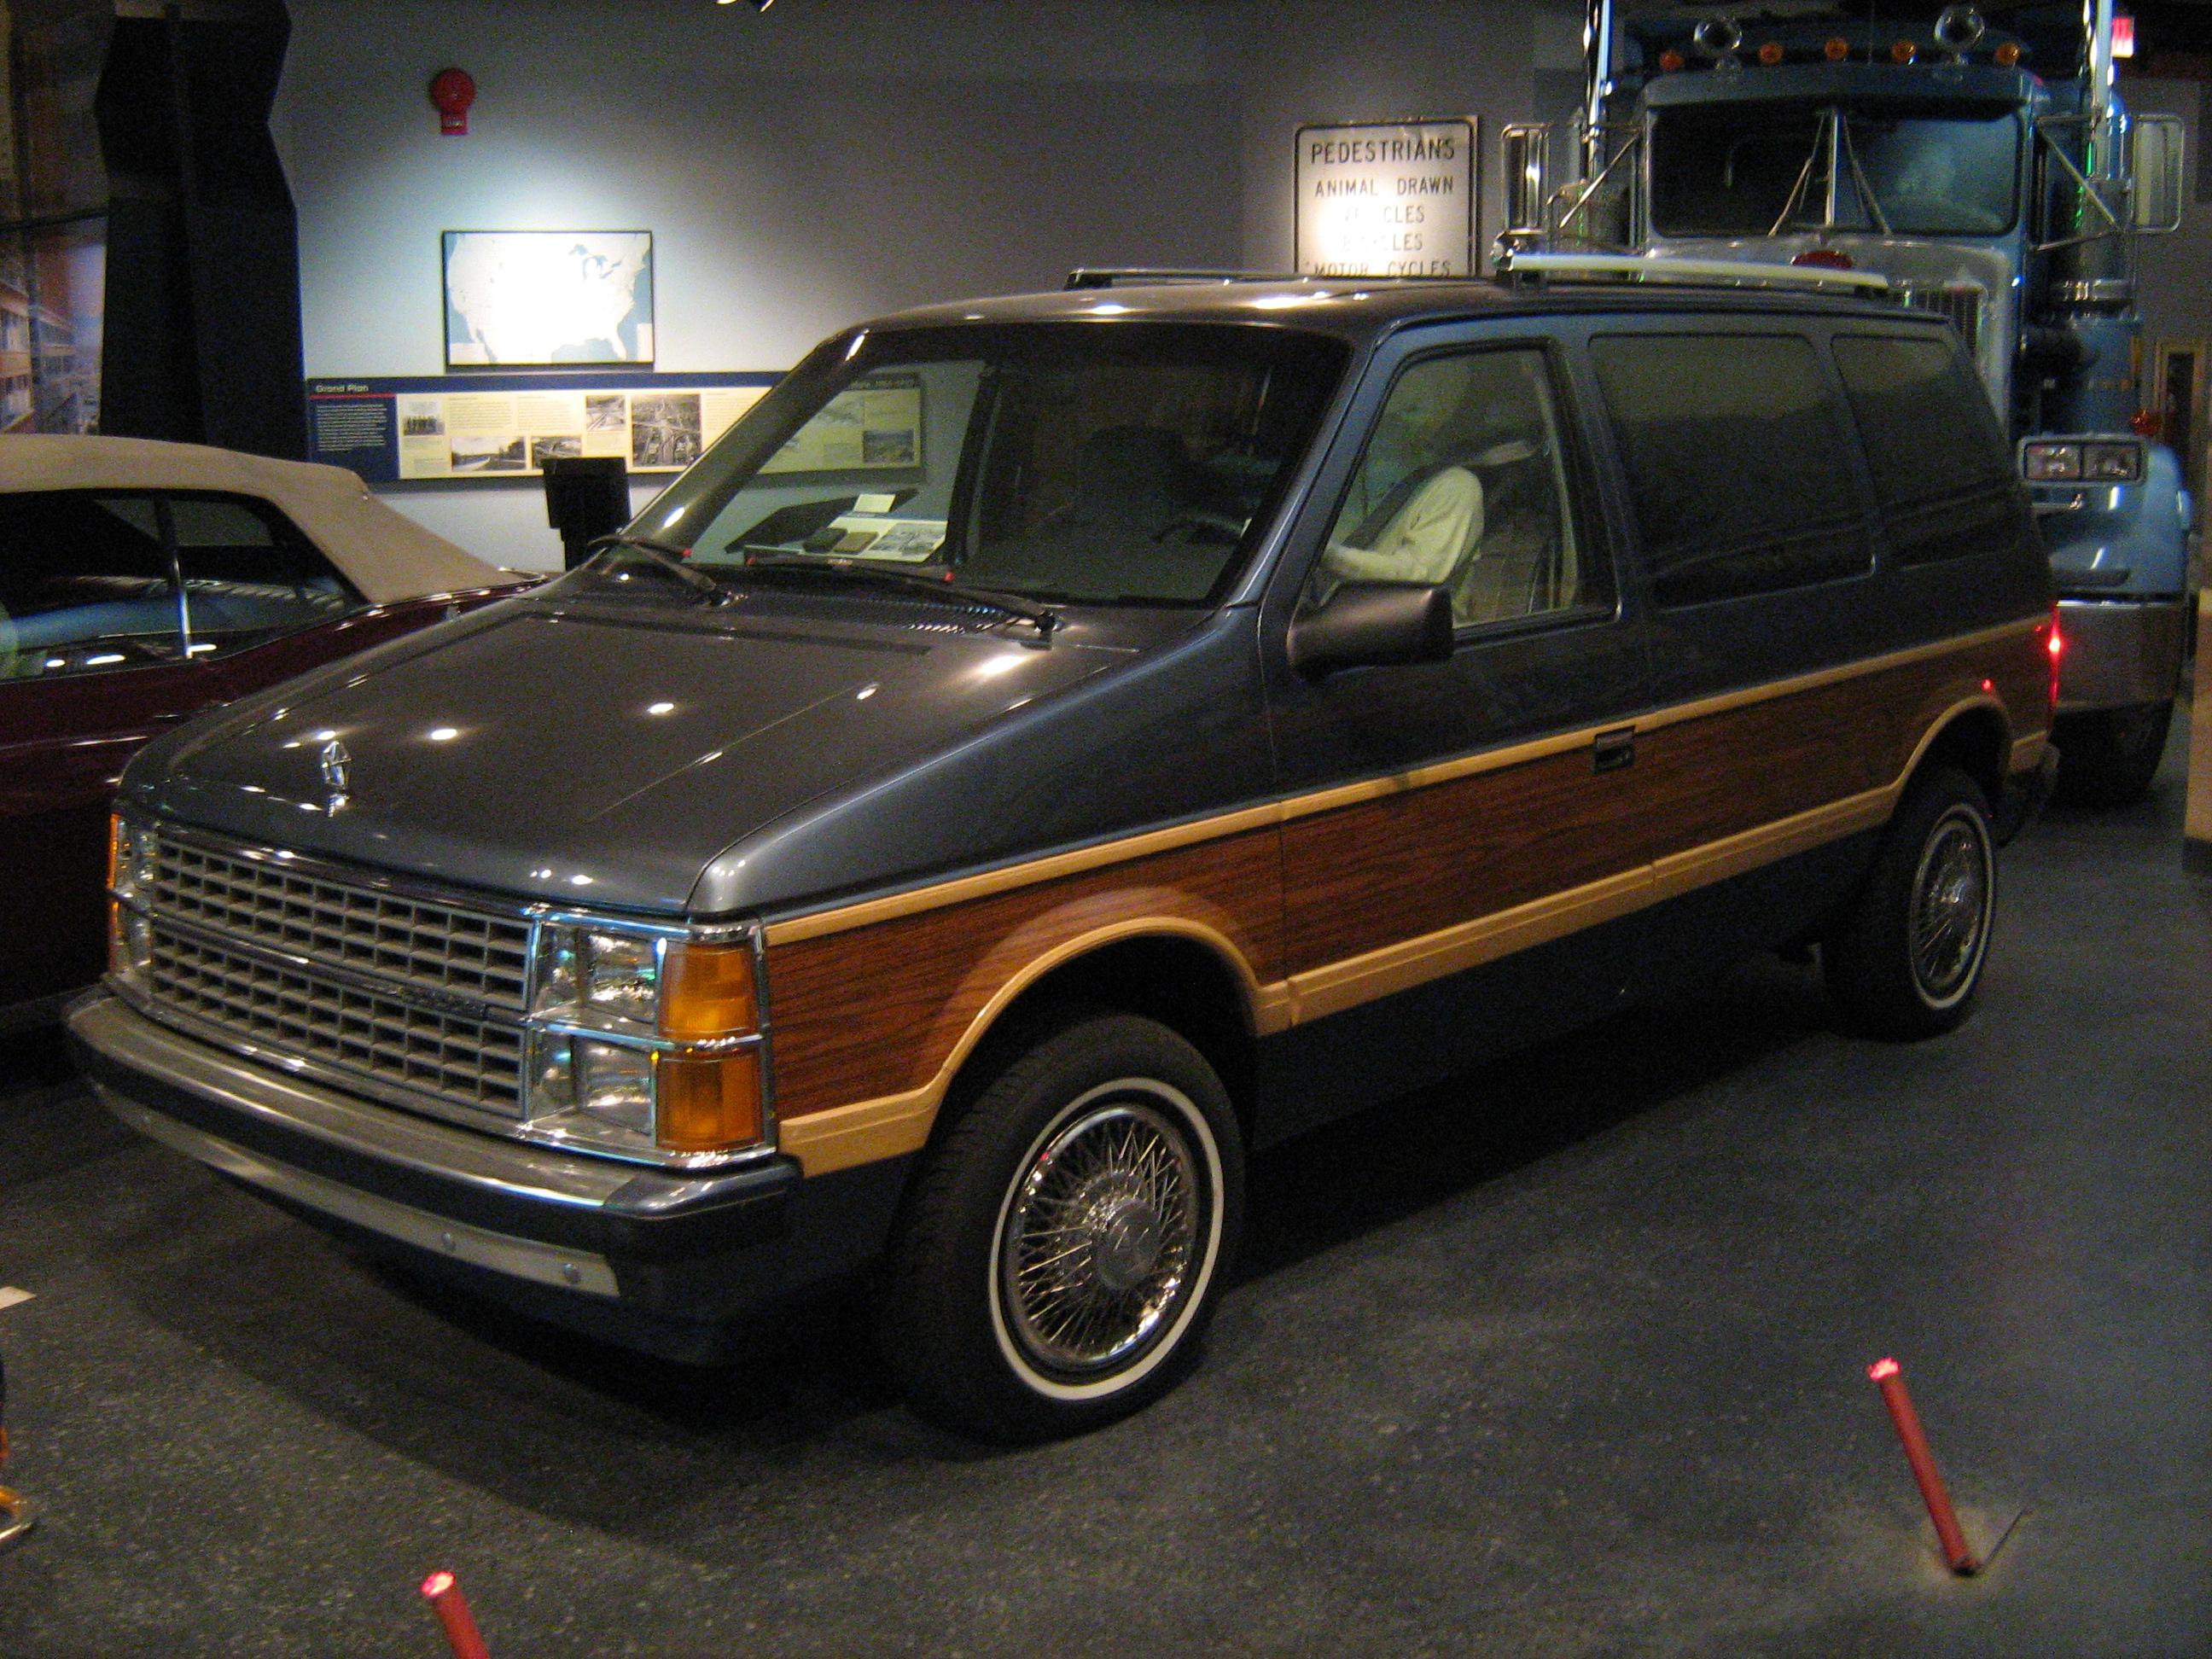 1988 Dodge Grand Caravan >> File:1986 Dodge Caravan Smithsonian National Museum of American History.jpg - Wikimedia Commons